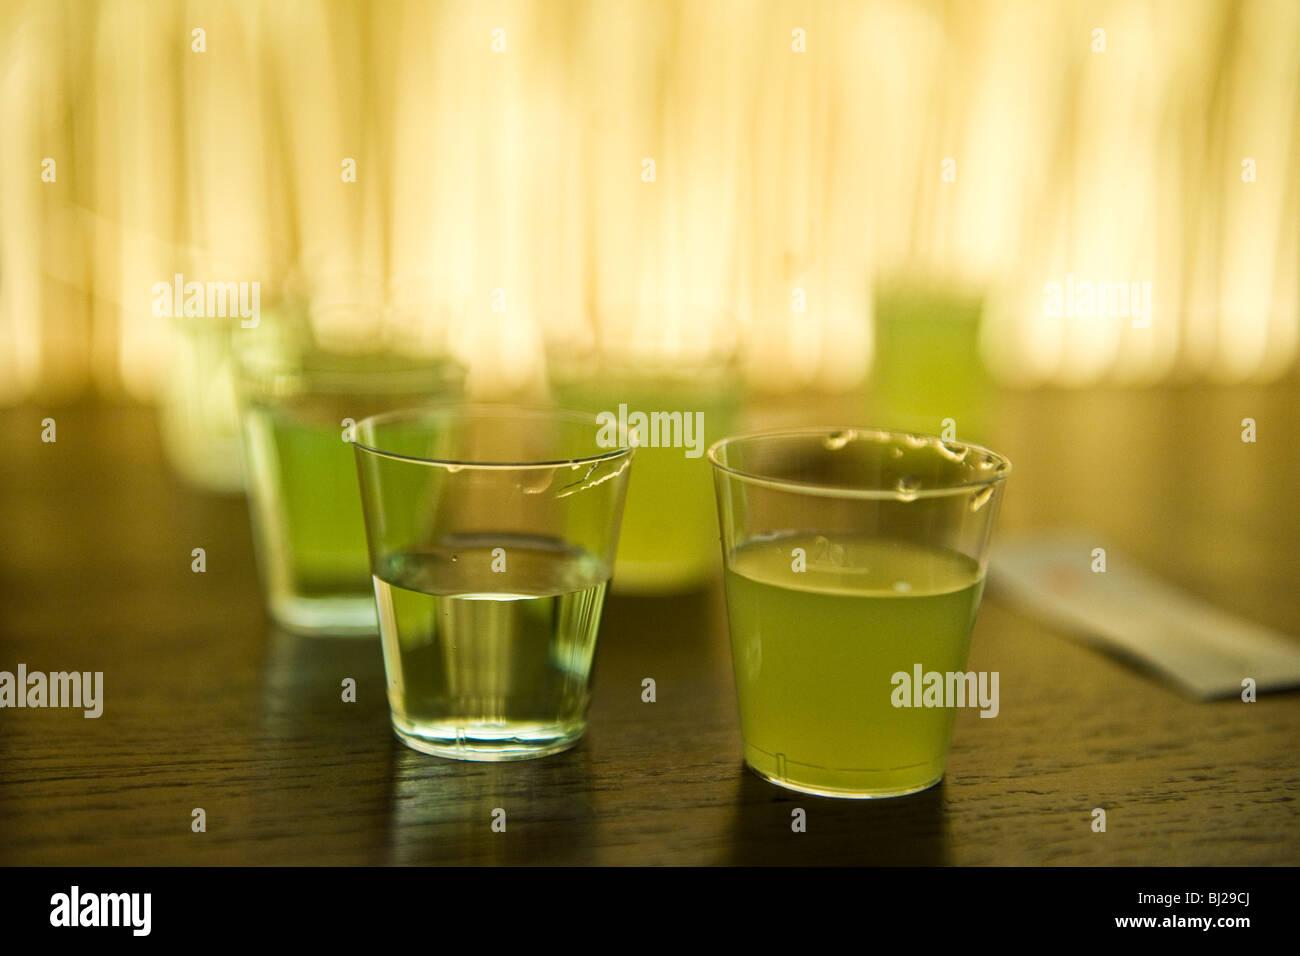 Absinthe tasting samples - Stock Image